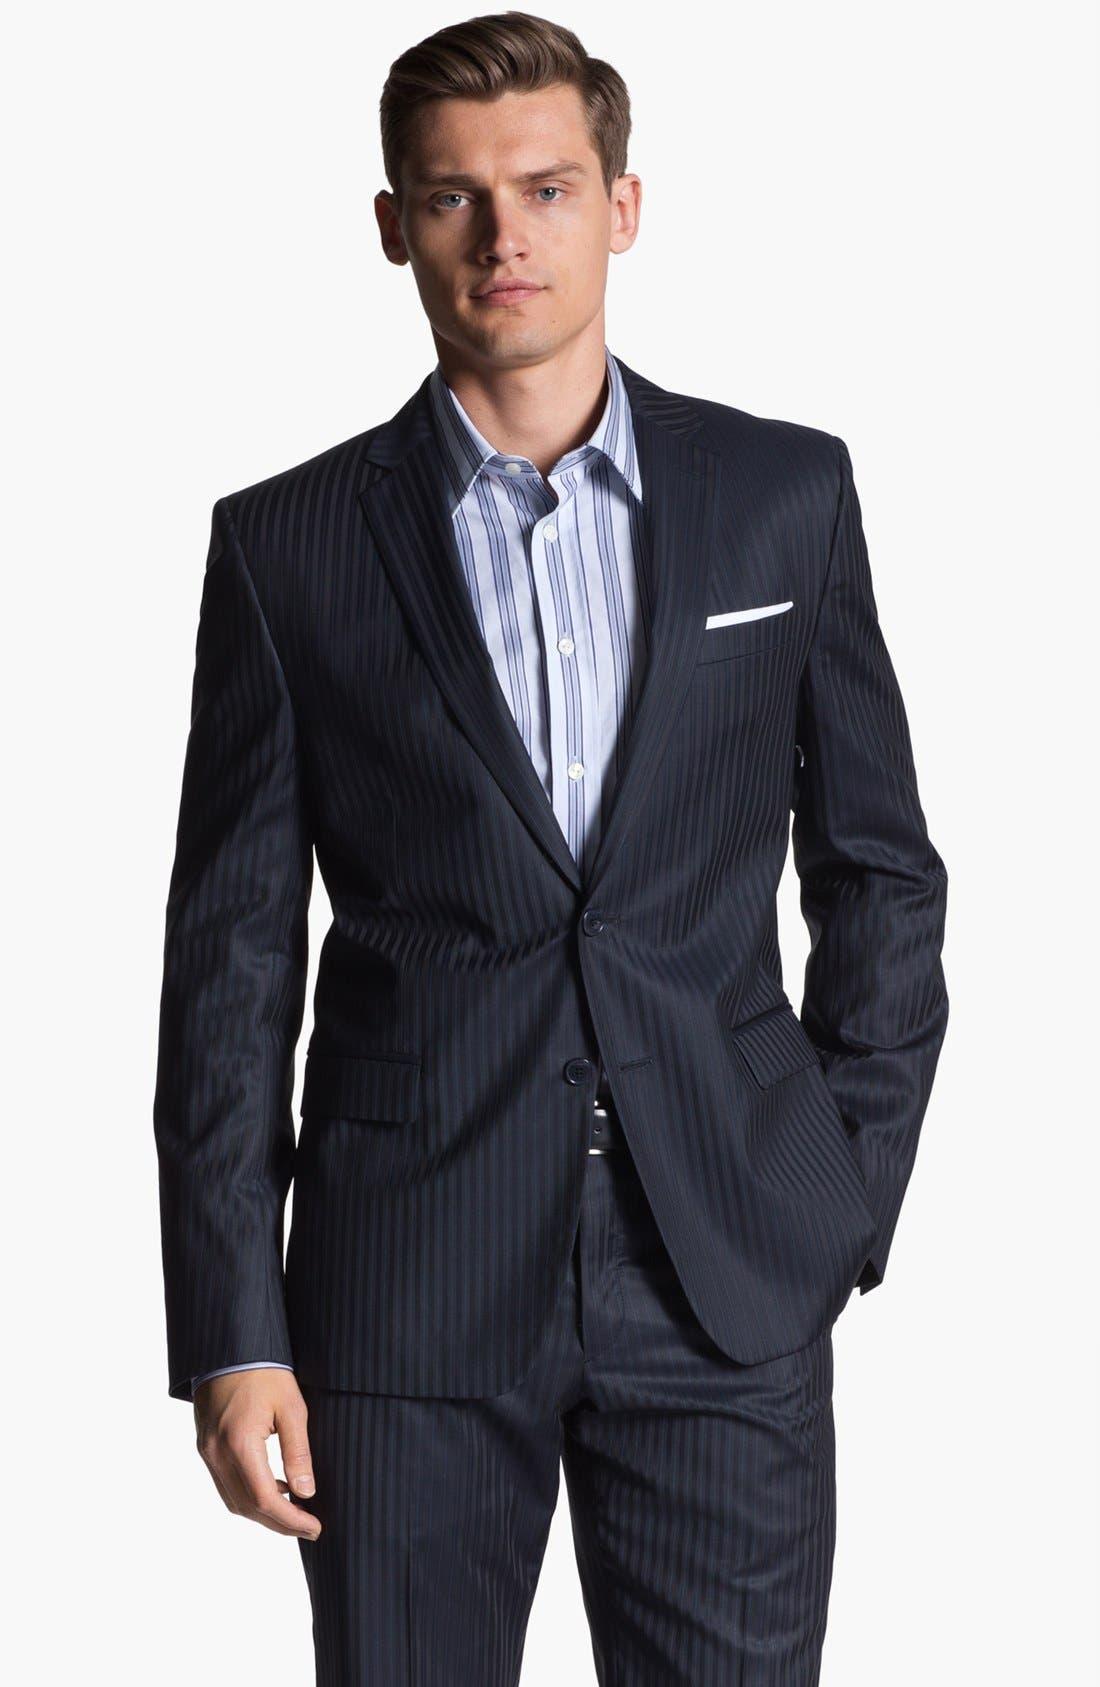 Alternate Image 1 Selected - Versace Trim Fit Stripe Suit